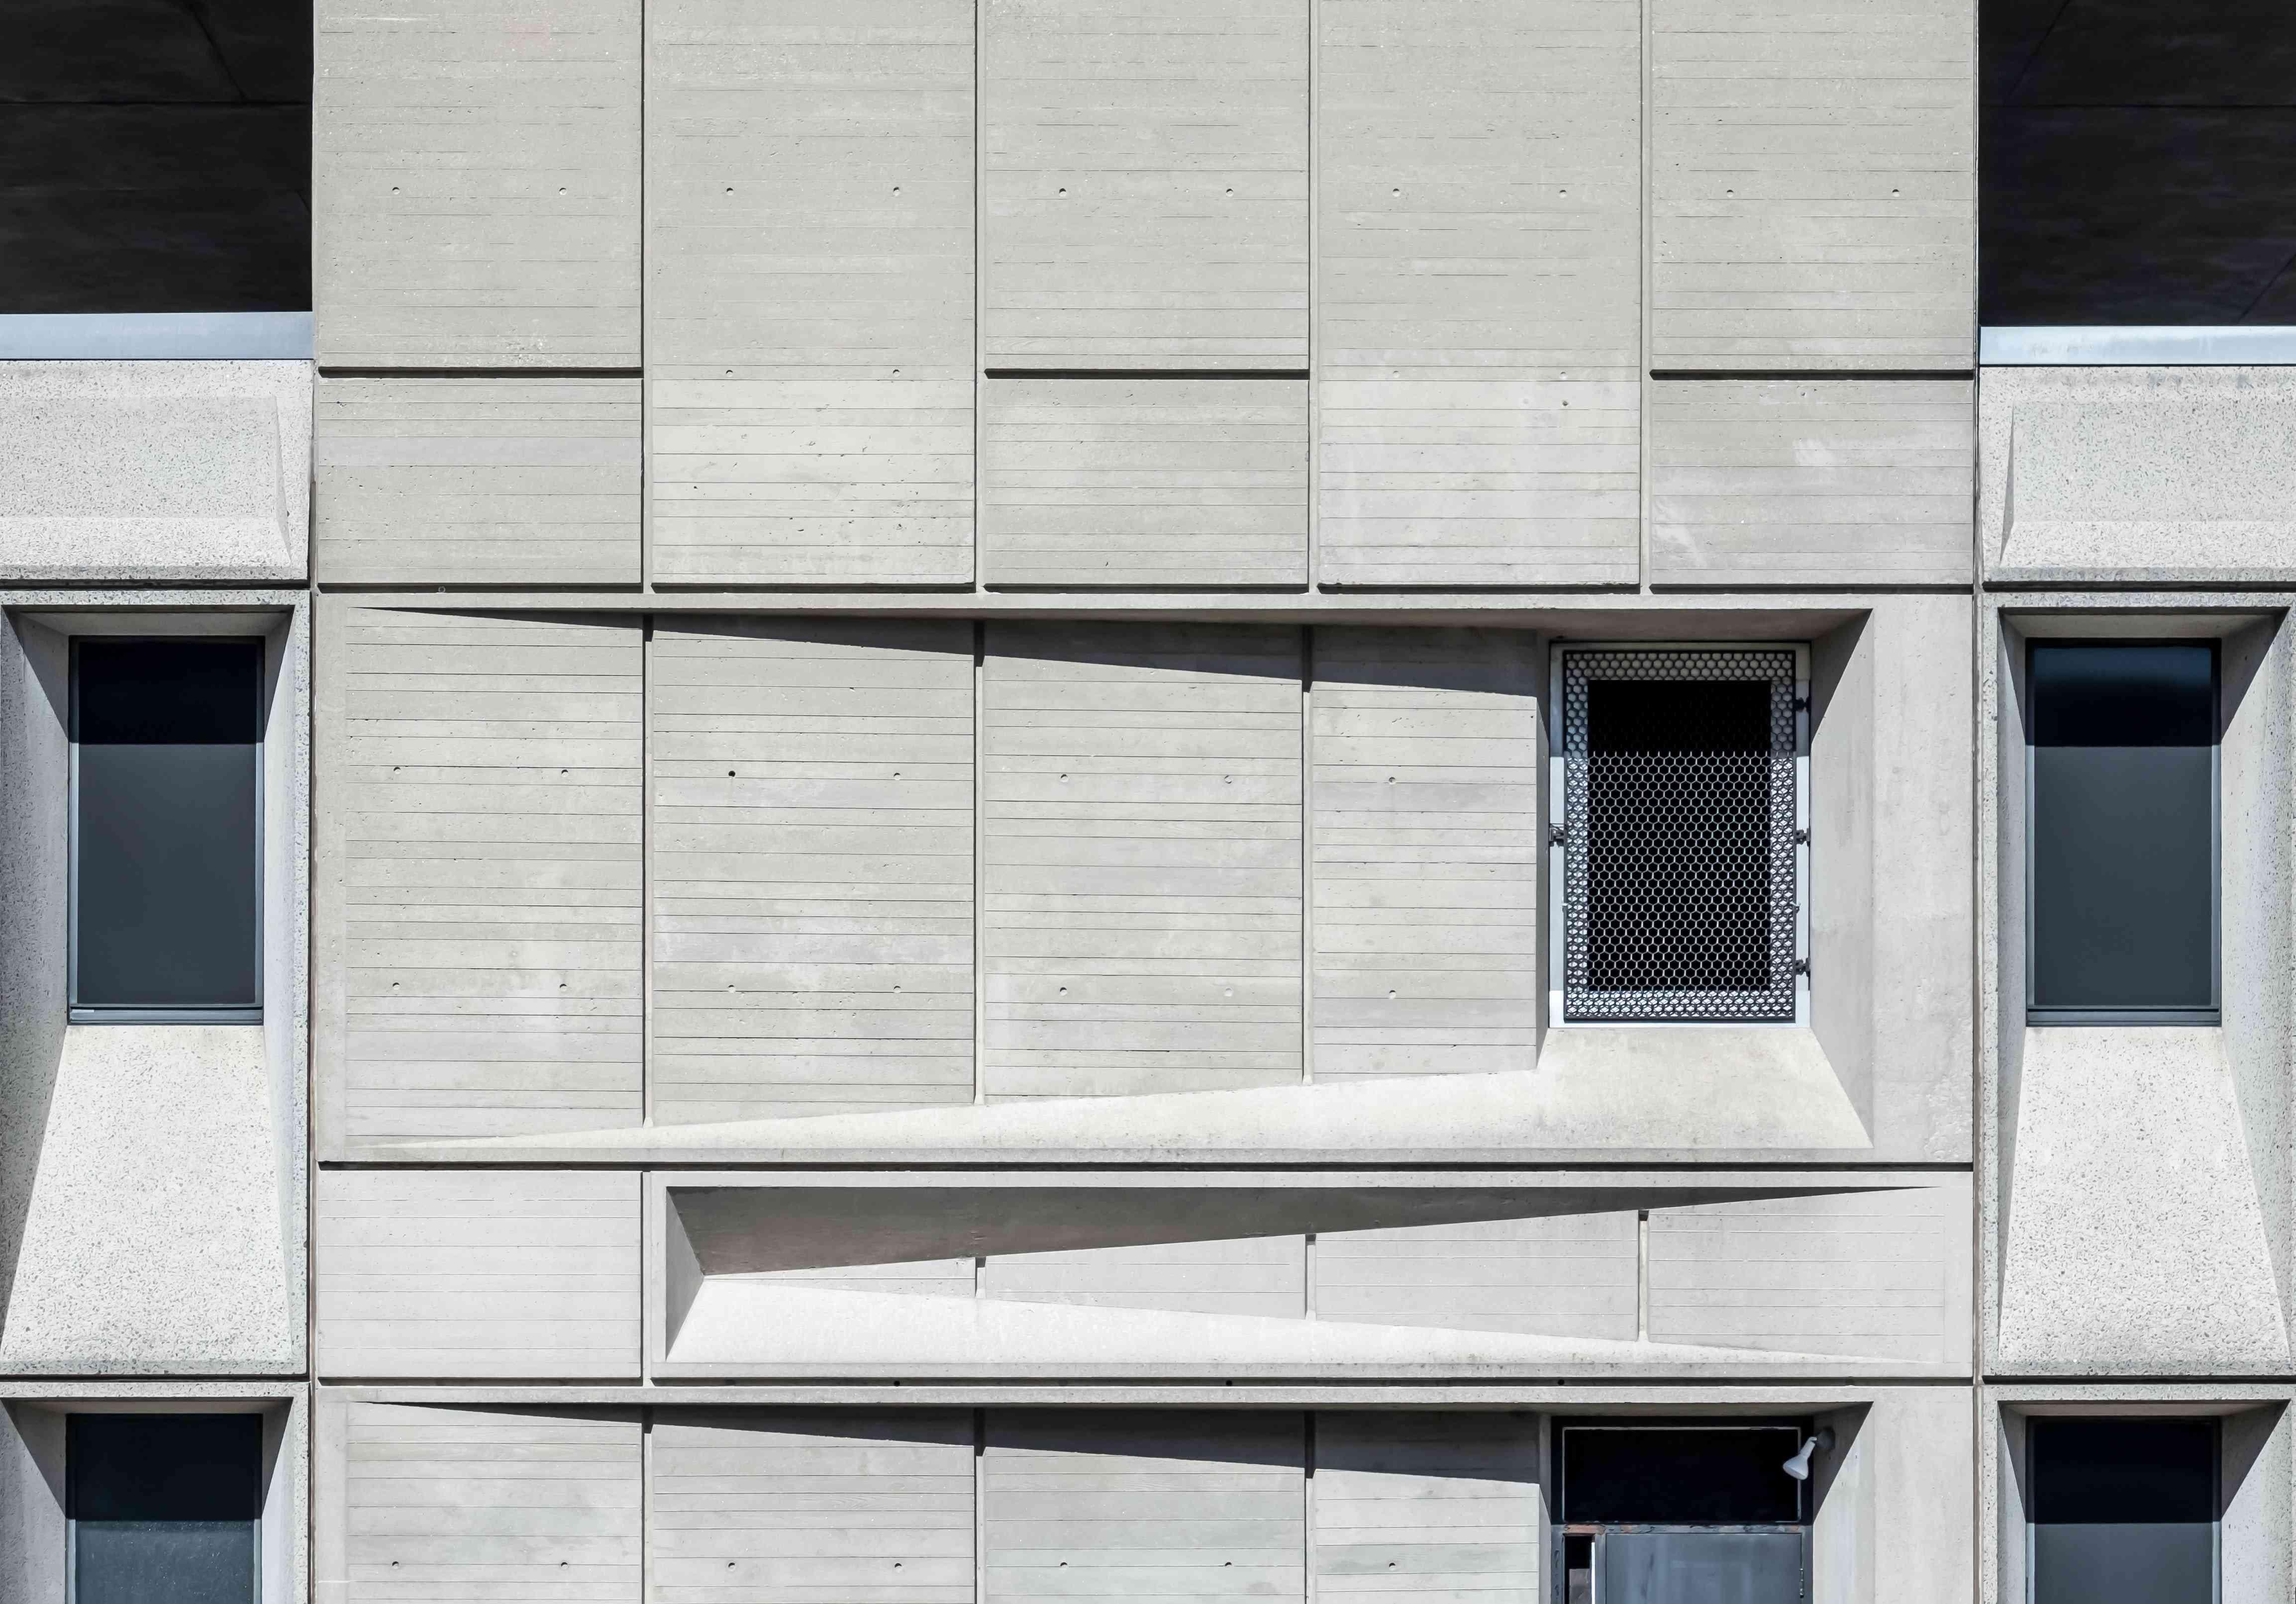 Exterior detail of concrete